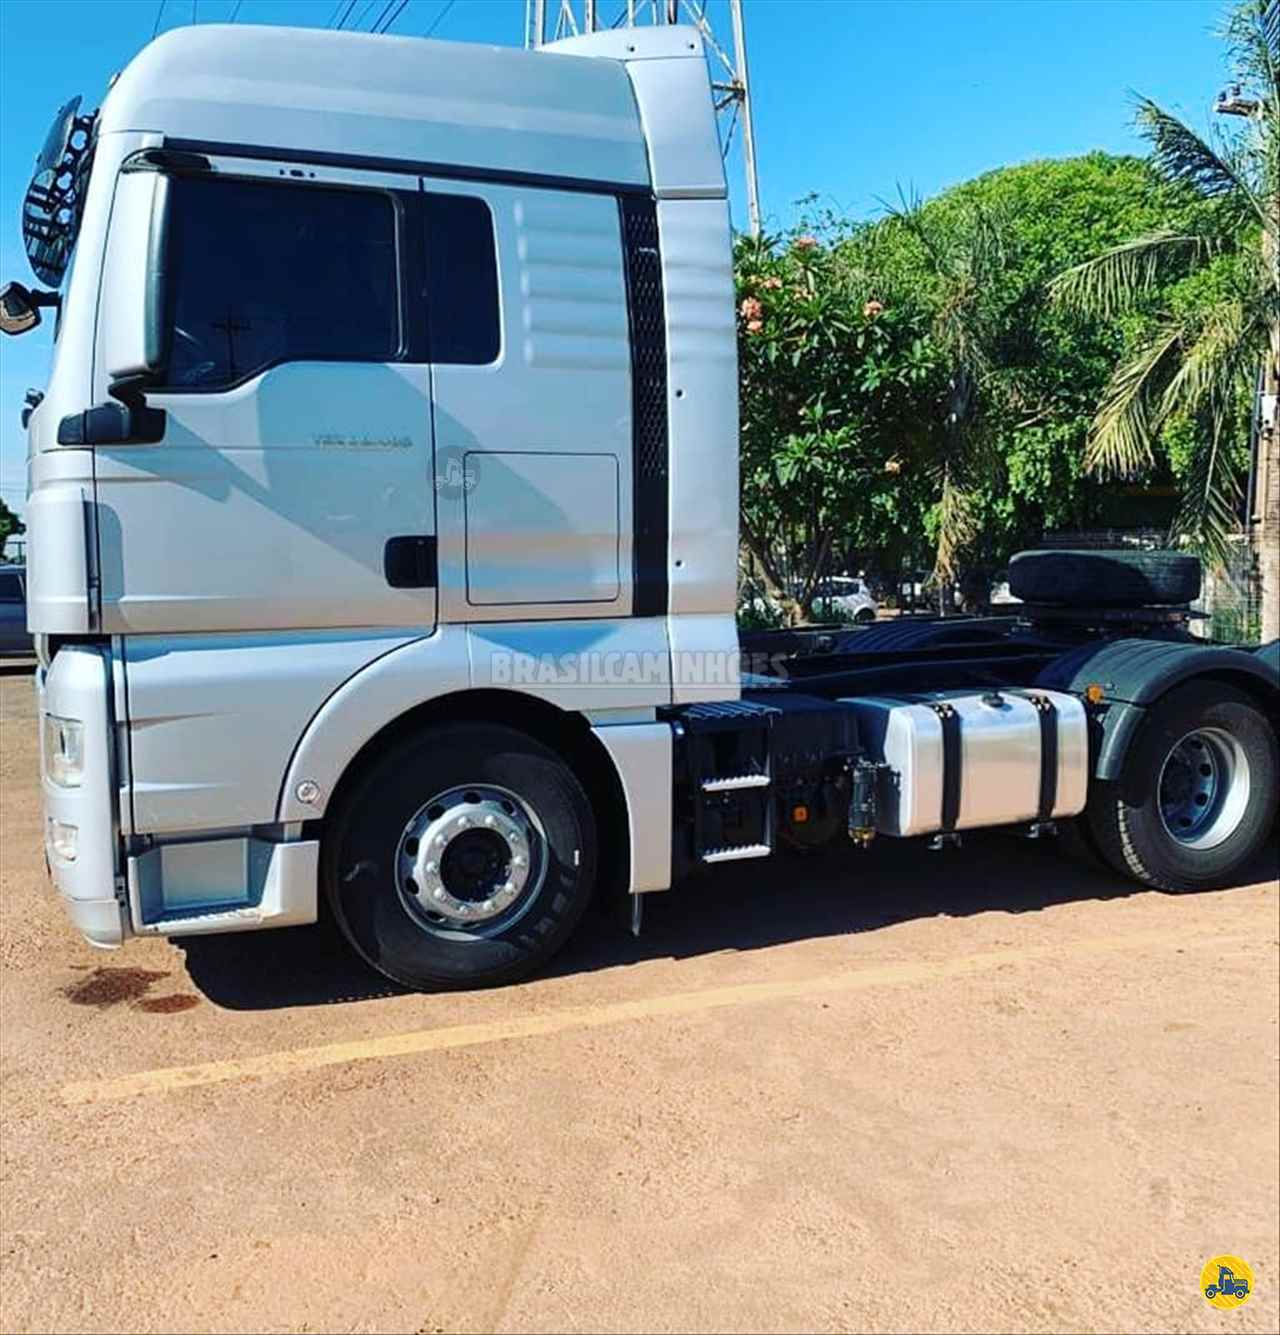 CAMINHAO MAN TGX 29 480 Cavalo Mecânico Traçado 6x4 Brasil Caminhões Sinop SINOP MATO GROSSO MT